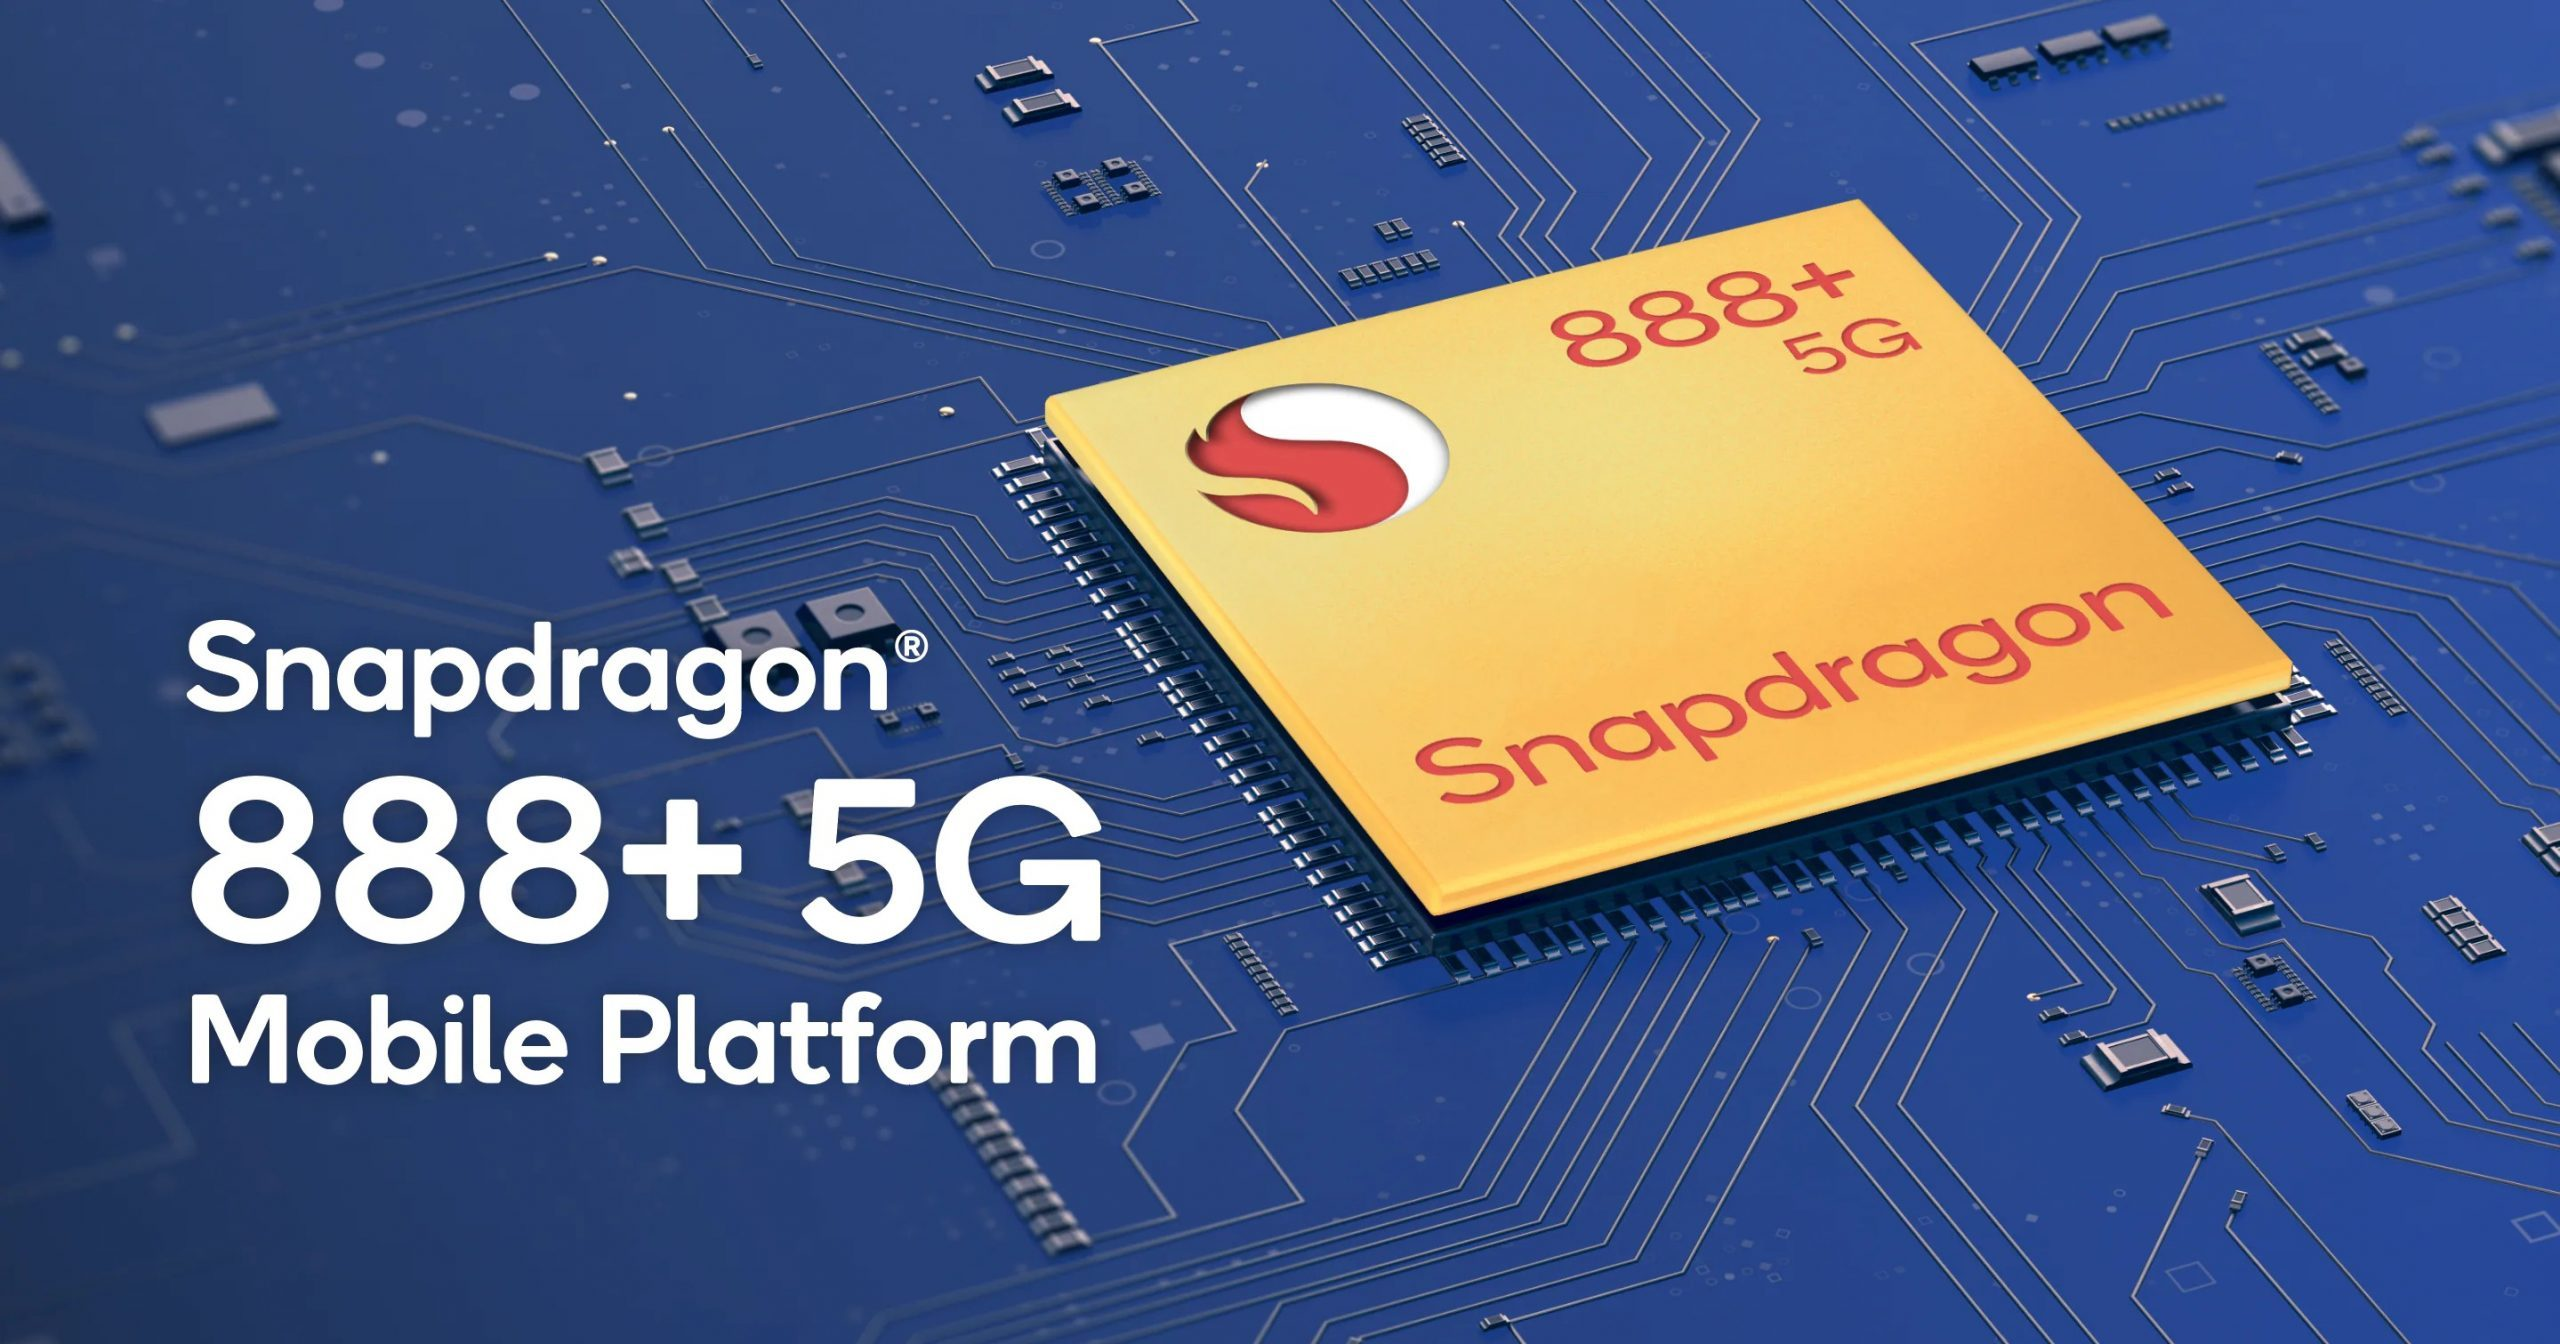 Snapdragon-888-+ 5G